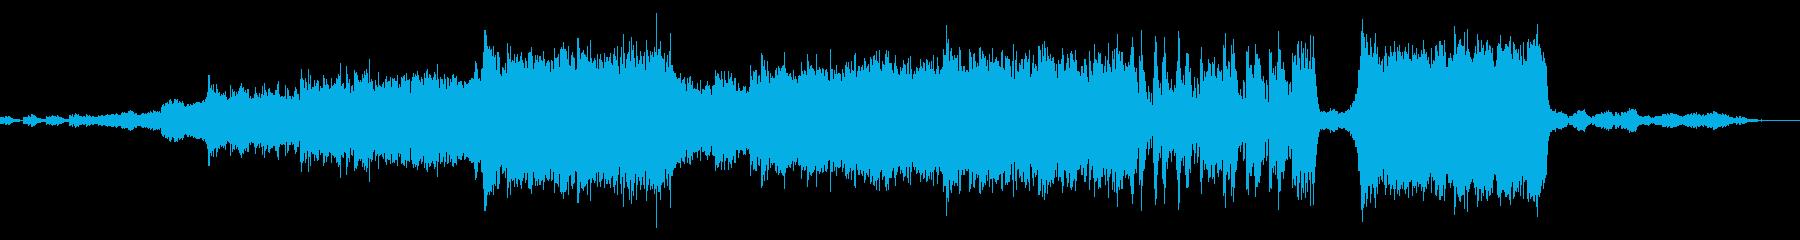 YAMATOの再生済みの波形